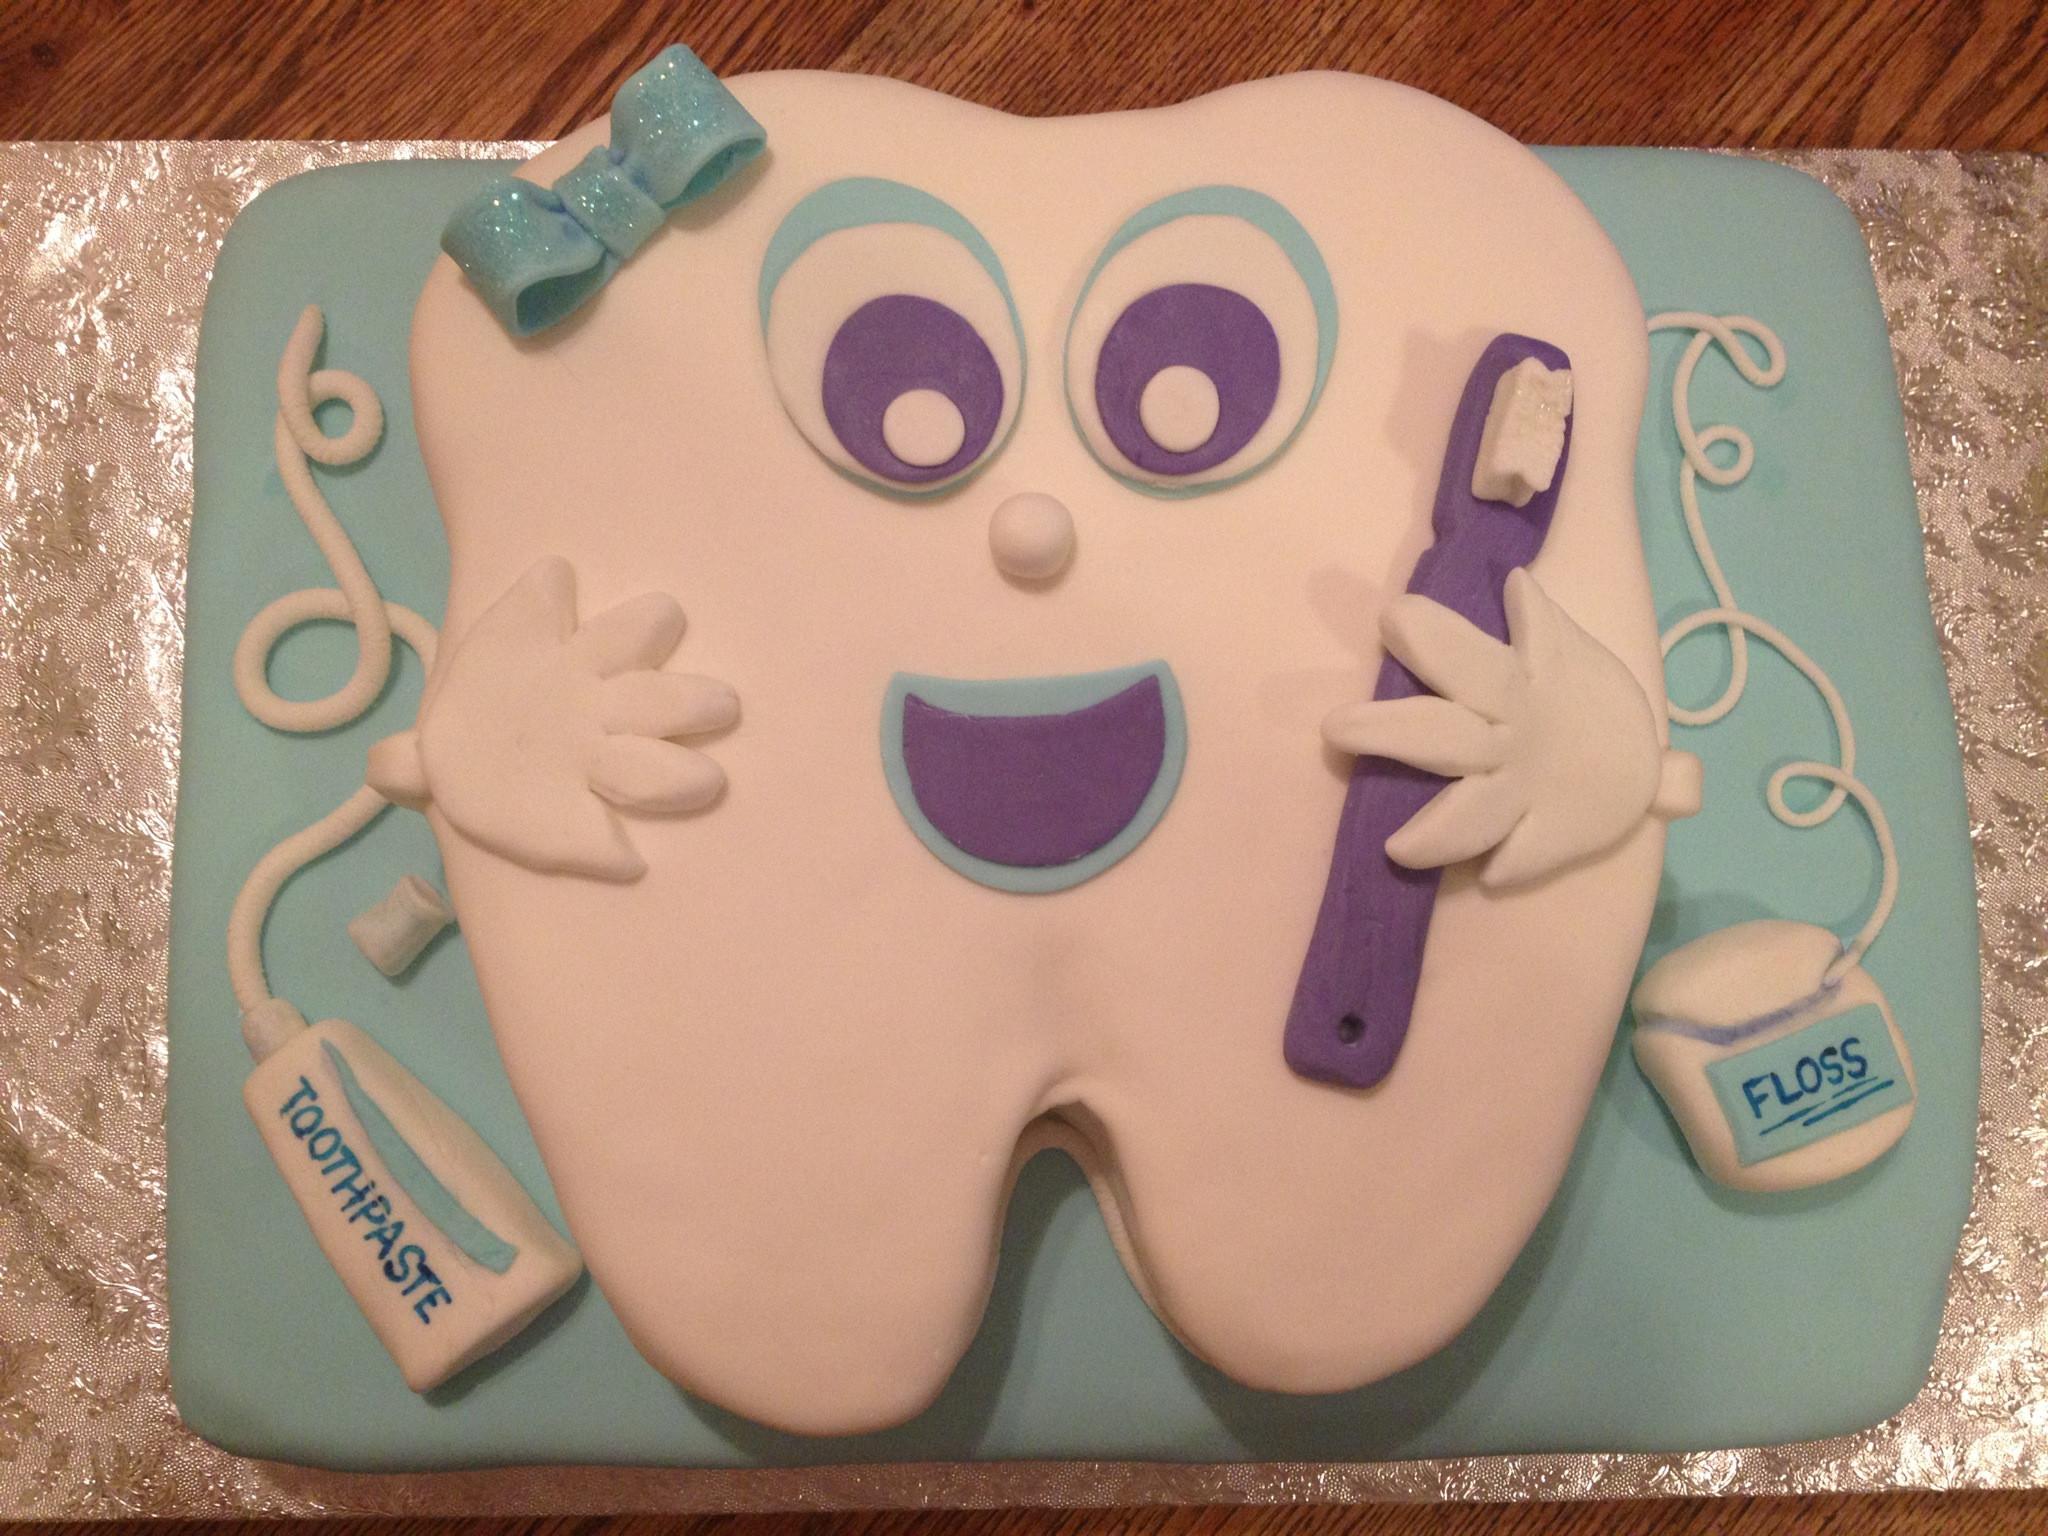 2048x1536 144 Best Dental Office Images On Pinterest